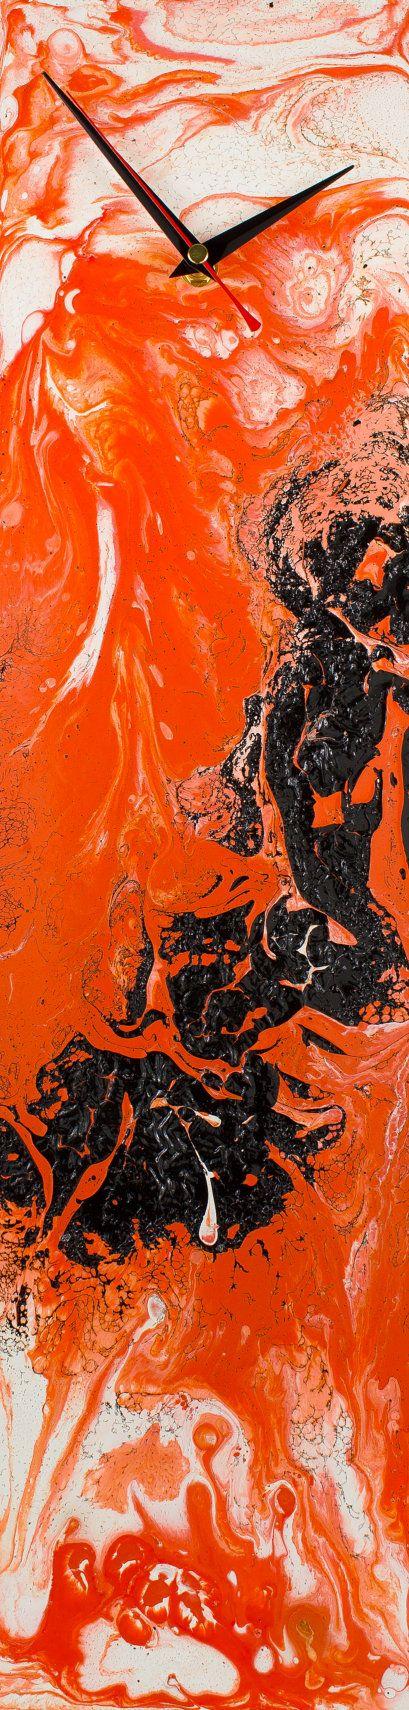 Orange Wall Clock, Minimal Clocks, Glass wall clock, Minimal wall art, Glass wall art, Handmade, by Craig Anthony, Reformations, on Etsy  (Please